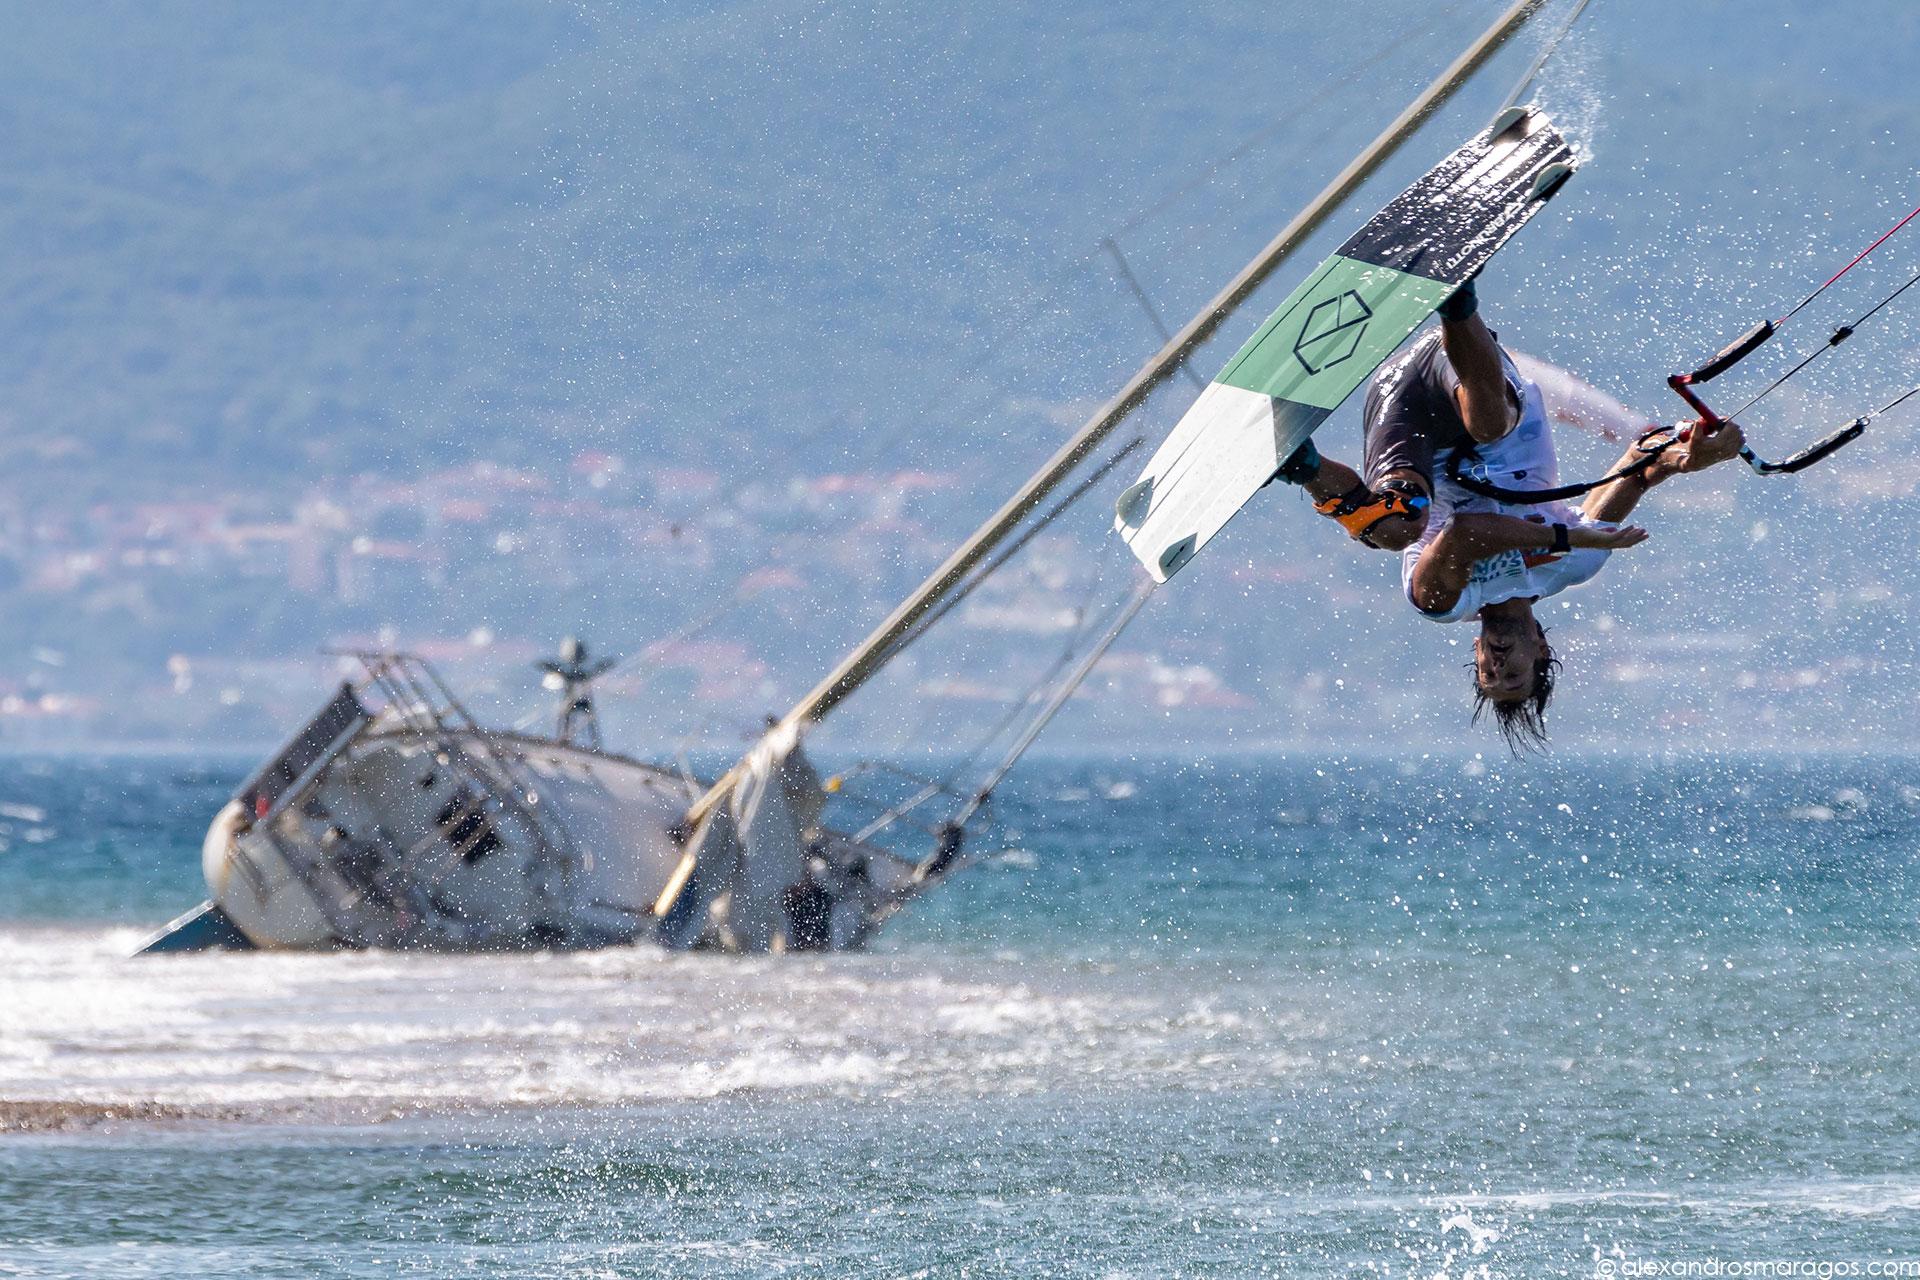 Youri Zoon performing at Cape Drepano, Greece |© Alexandros Maragos